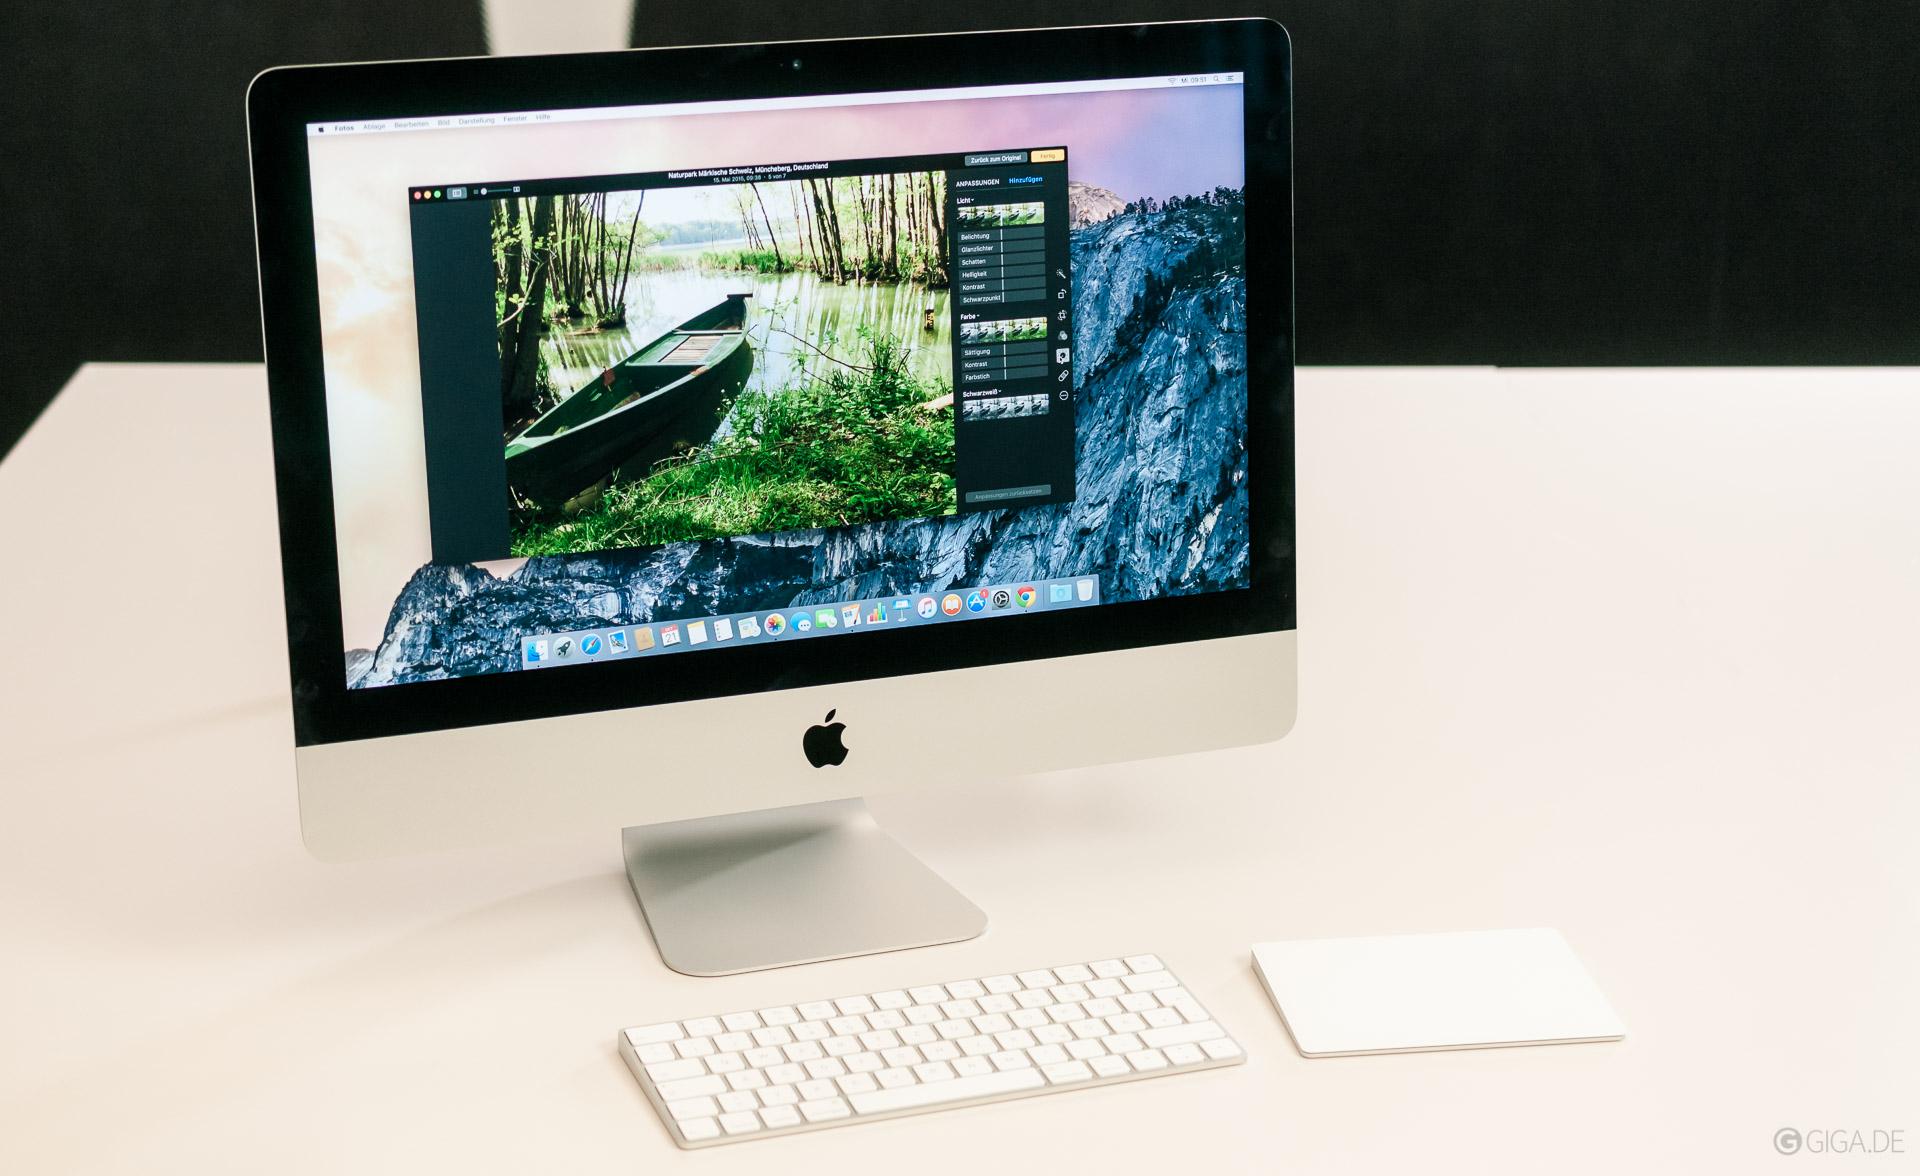 21 5 zoll imac mit retina 4k display daten preise test herbst 2015 alle infos bei giga. Black Bedroom Furniture Sets. Home Design Ideas